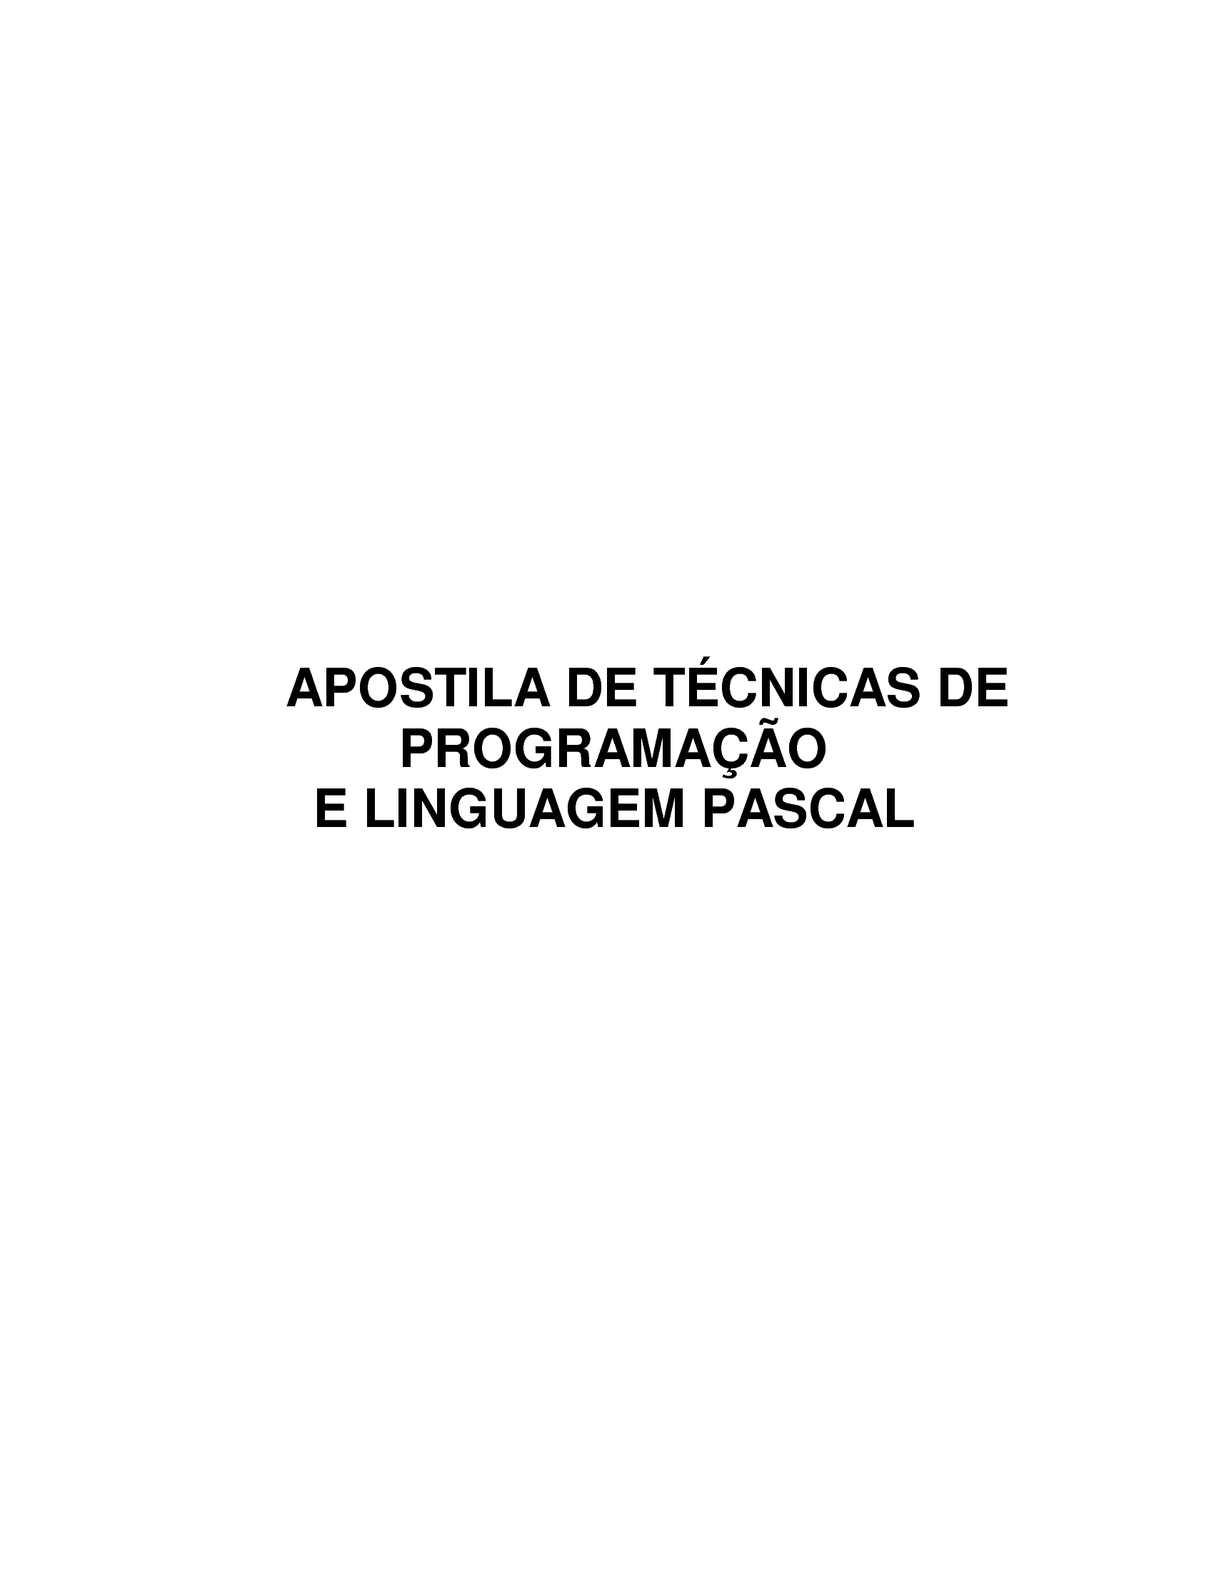 apostila pascal